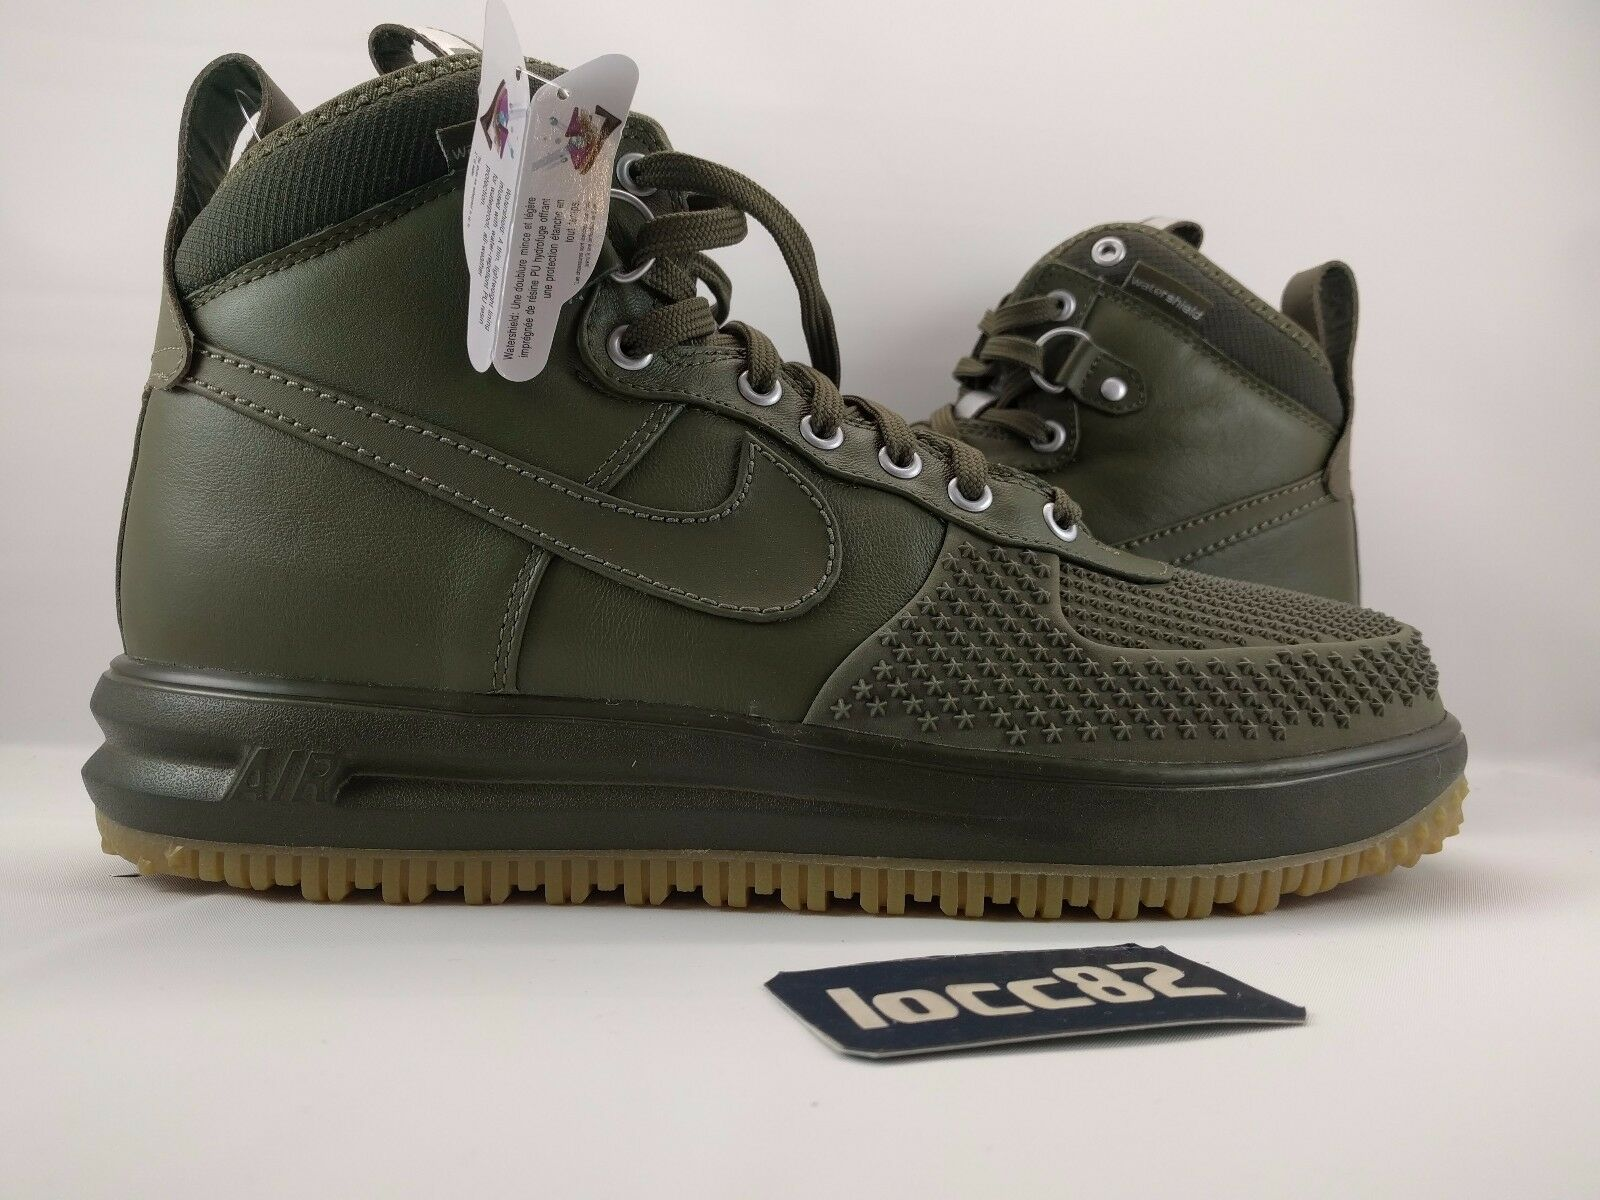 Nike Men Lunar Force 1 Sneakerboot Duckboot sz 7.5 [805899 201] Olive army camo